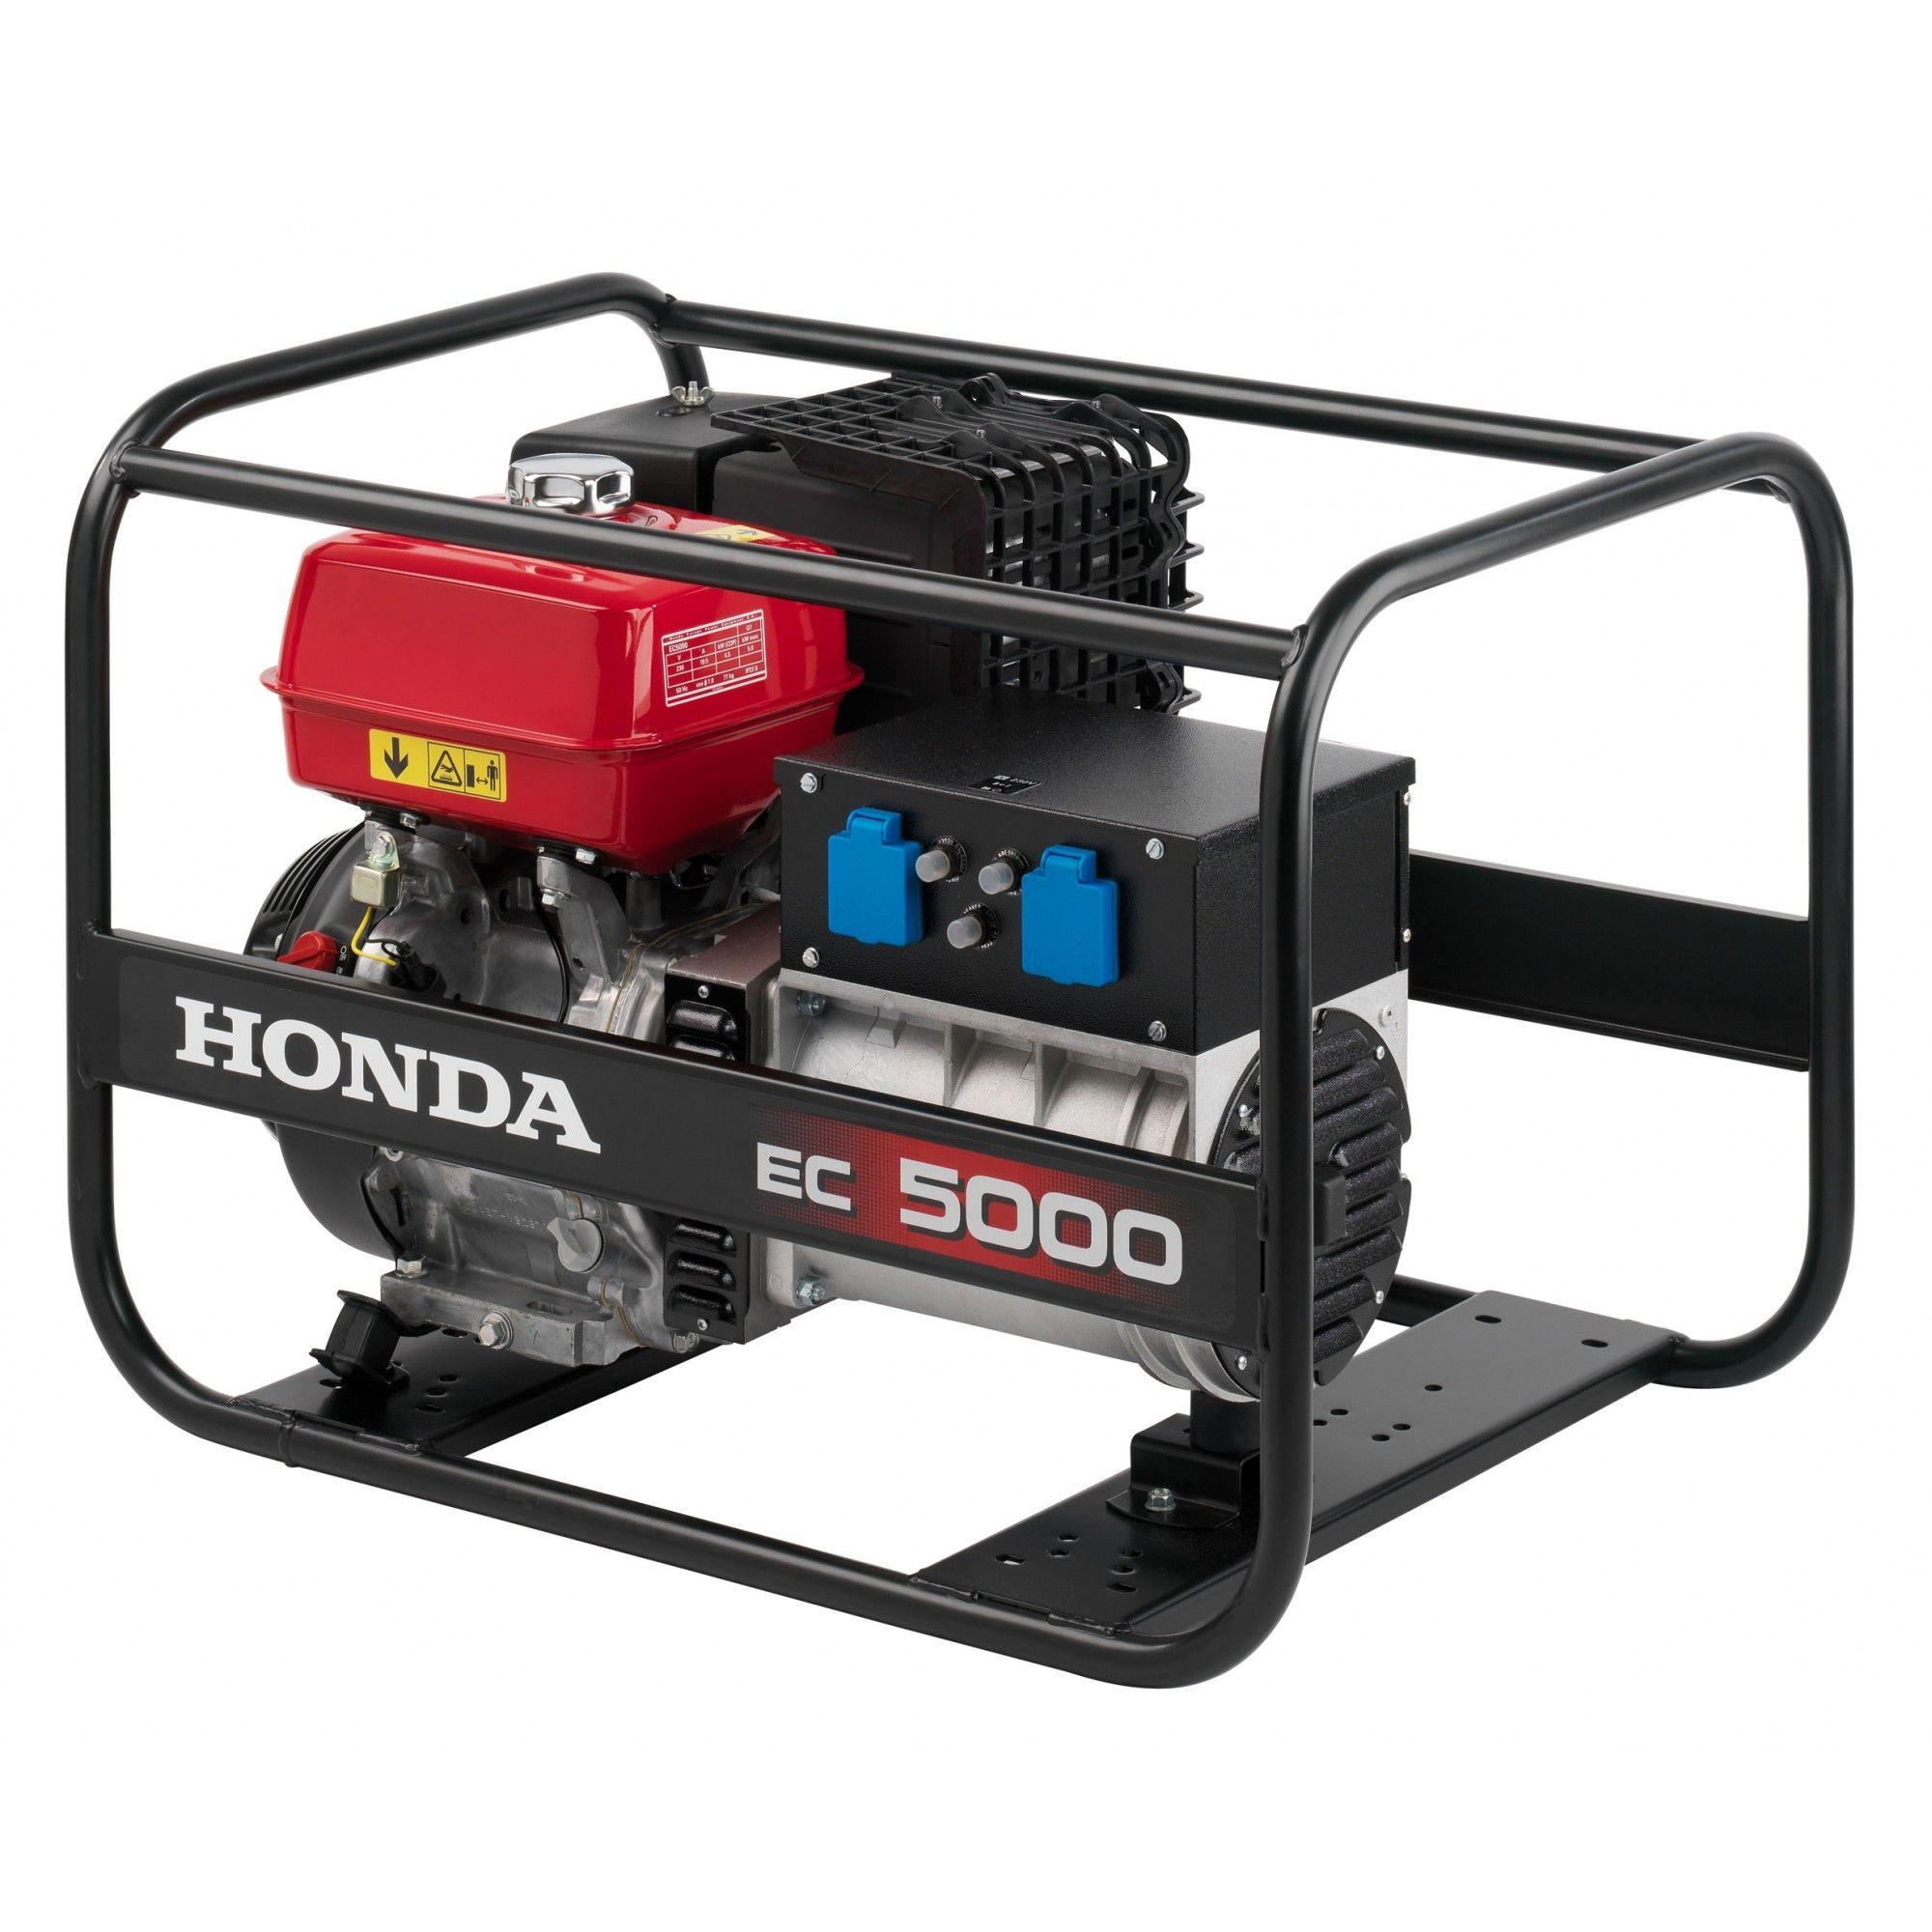 - Honda EC 5000 duurzaam aggregaat/generator